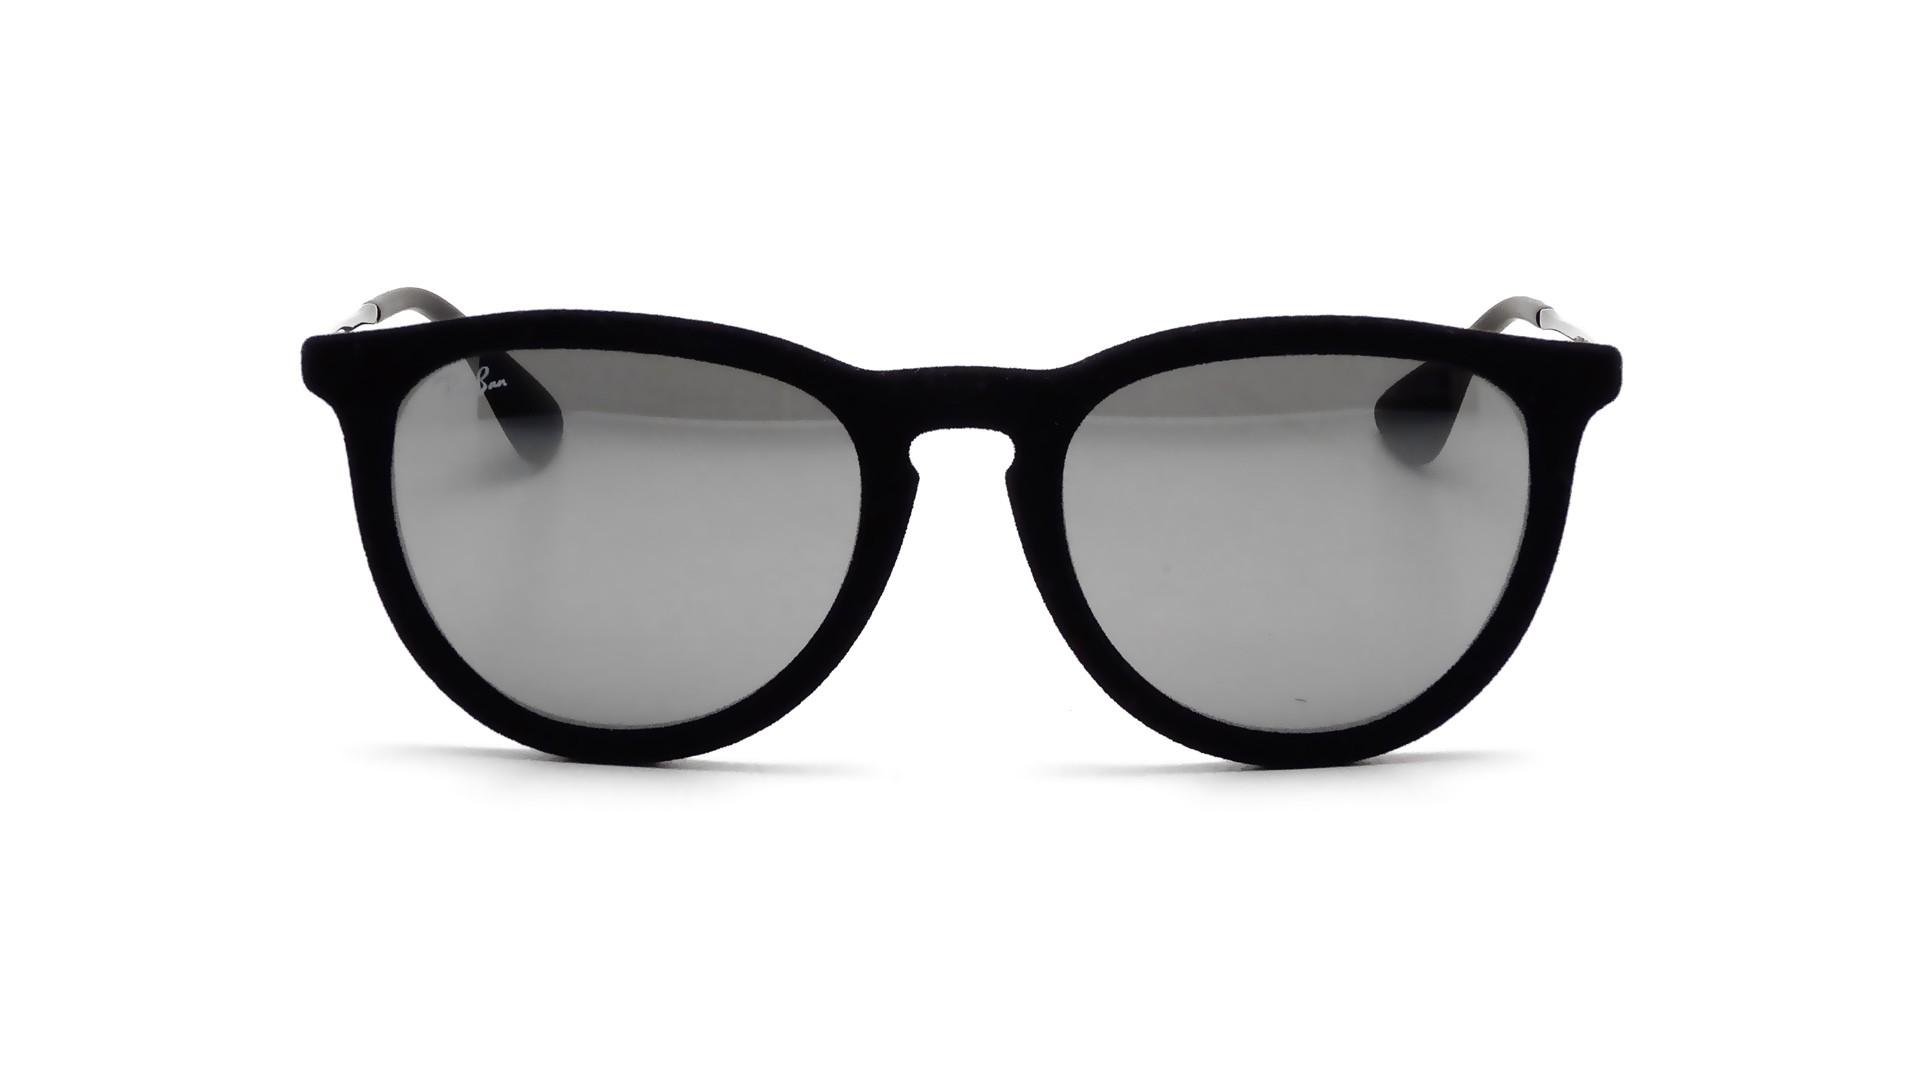 81edfcdc61003 Sunglasses Ray-Ban Erika Velvet Edition Black RB4171 6075 6G 54-18 Medium  Mirror